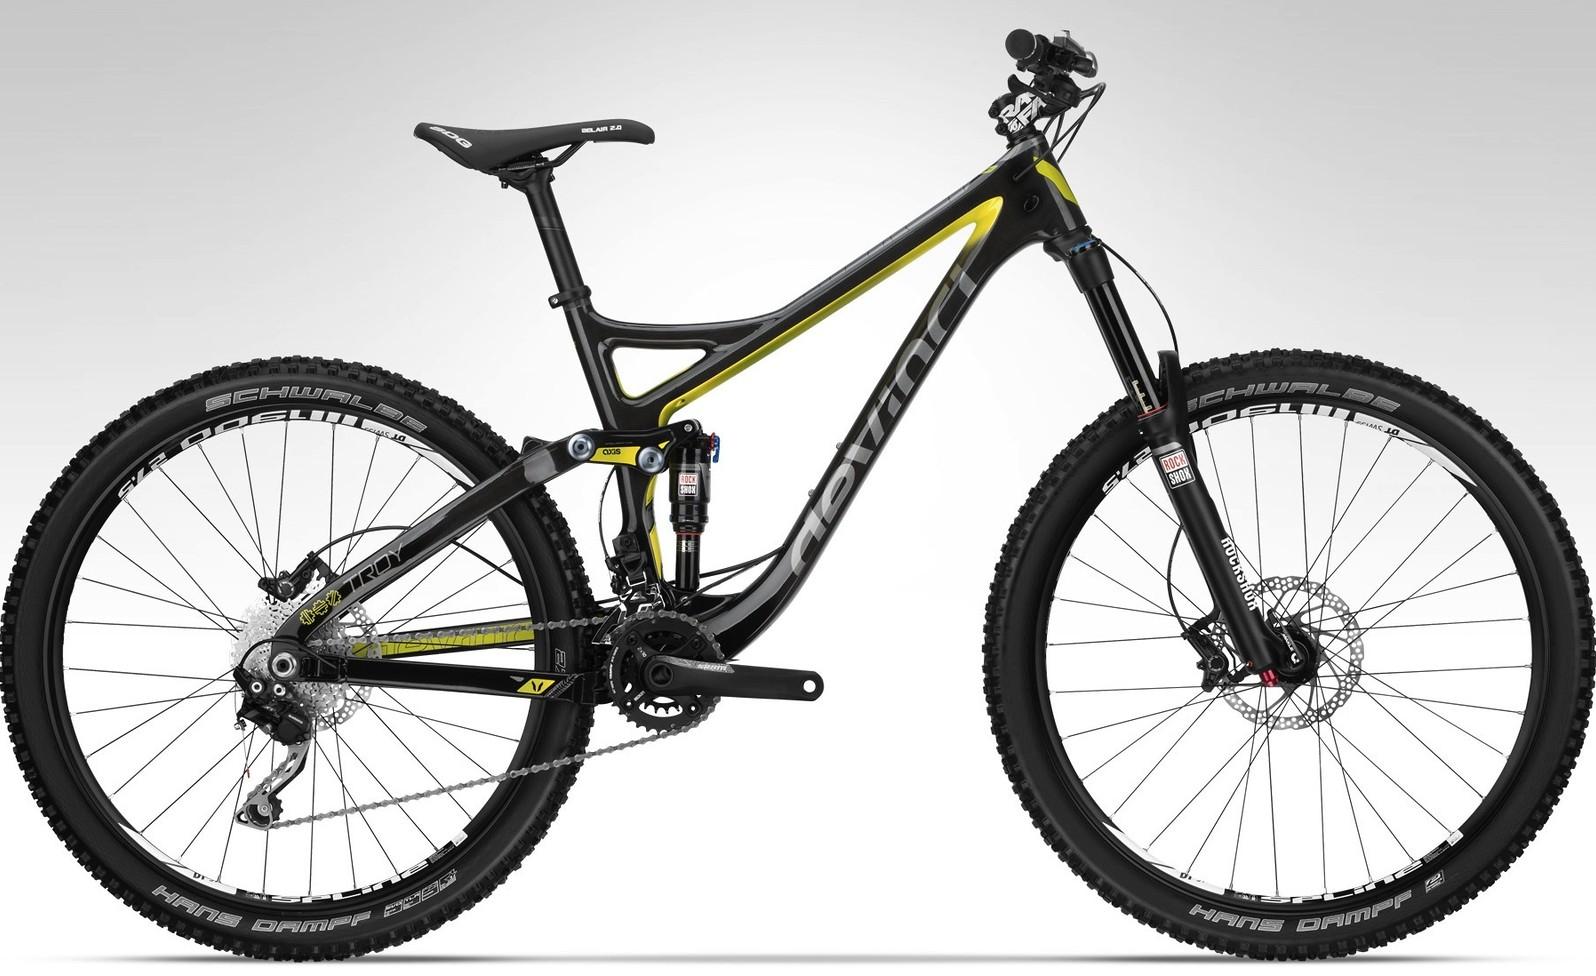 Devinci TROY CARBON RC bike